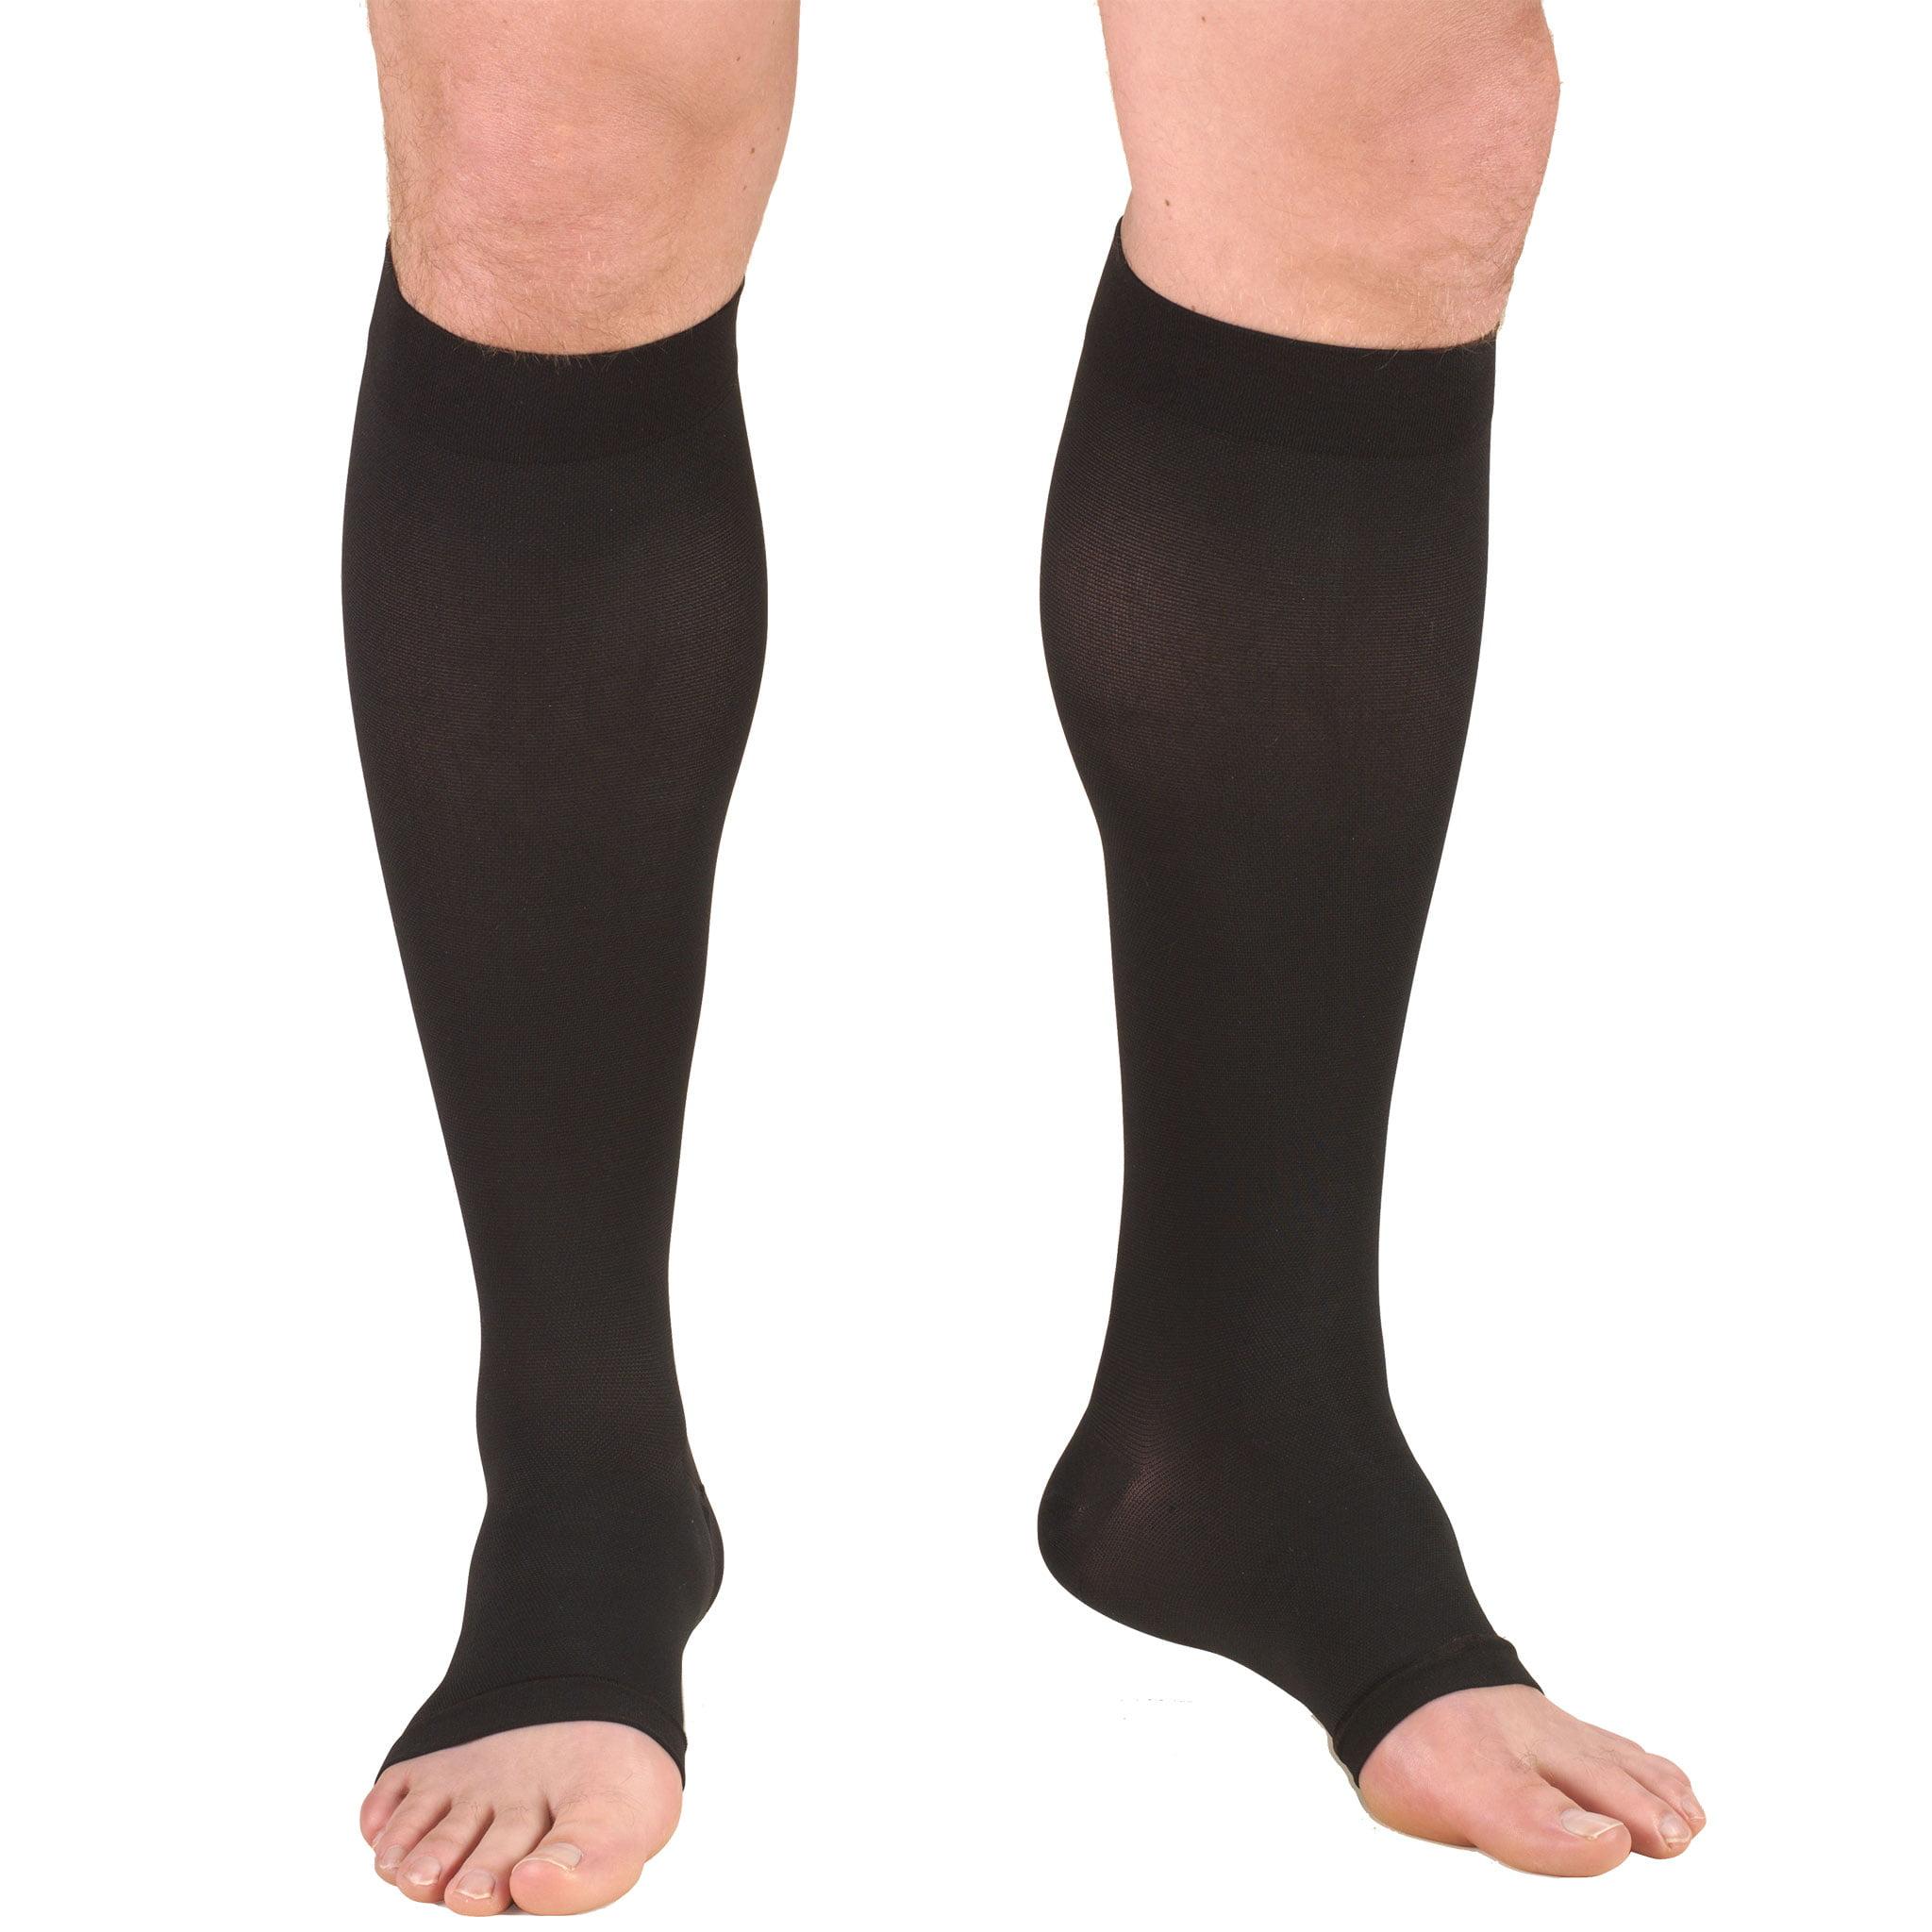 Truform Stockings, Knee High, Open Toe: 20-30 mmHg, Black, Large